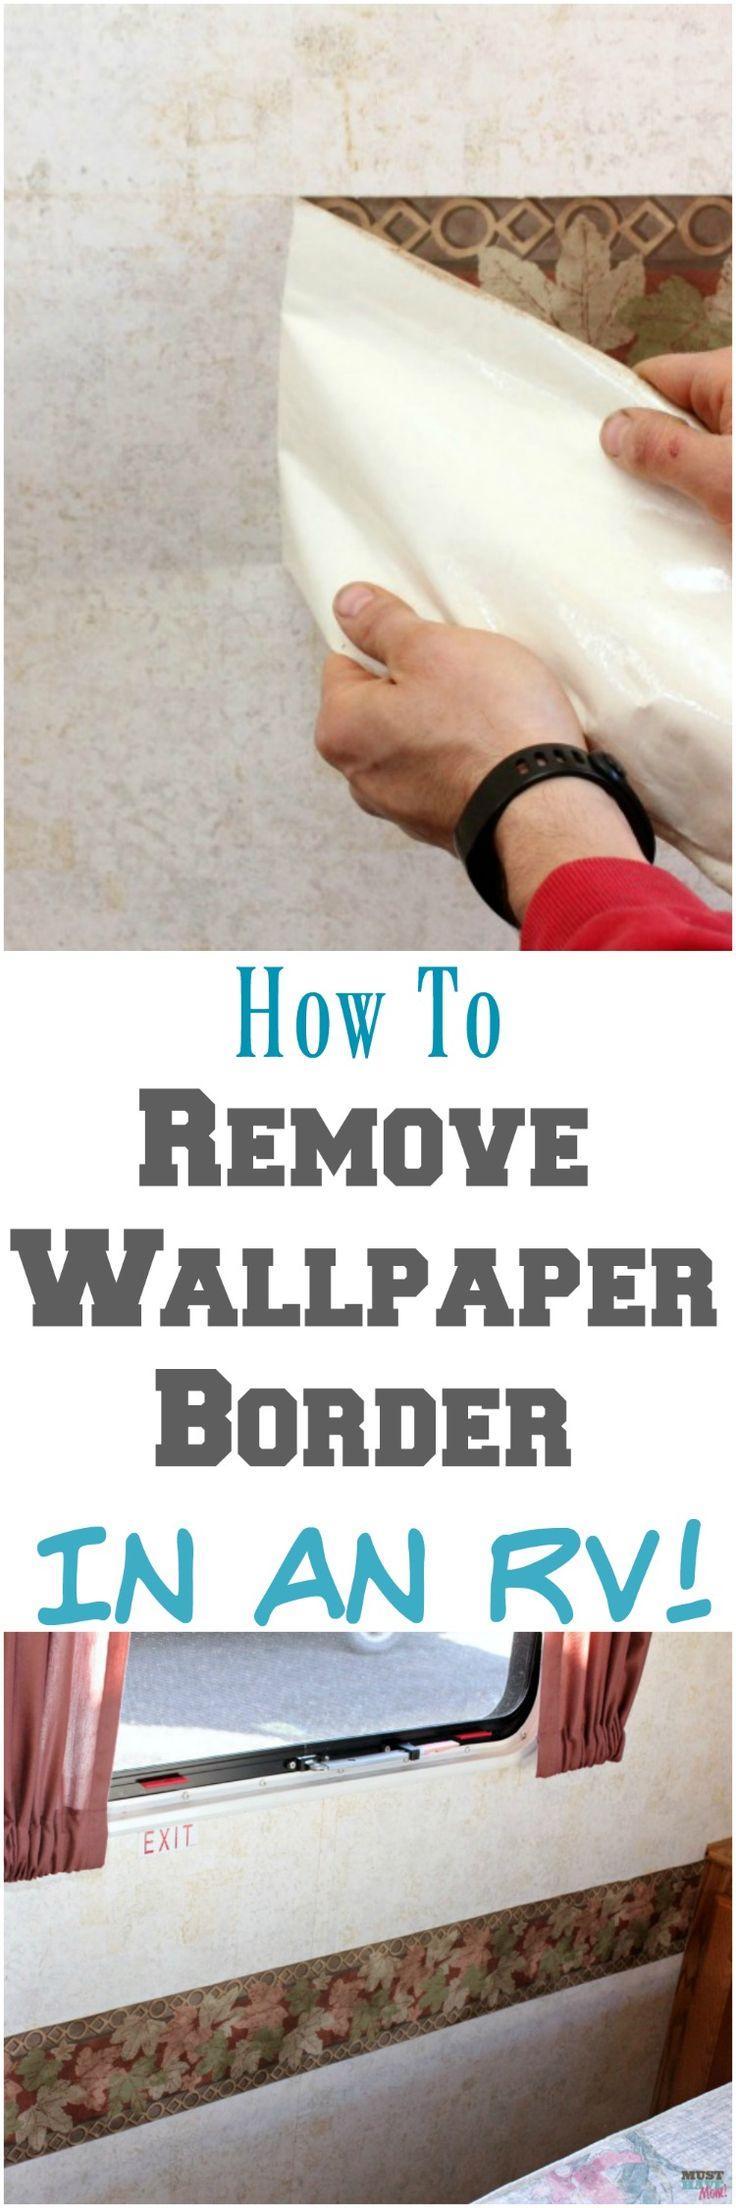 Best 25+ Wallpaper borders ideas on Pinterest | Wallpaper borders for bedrooms, Removing ...